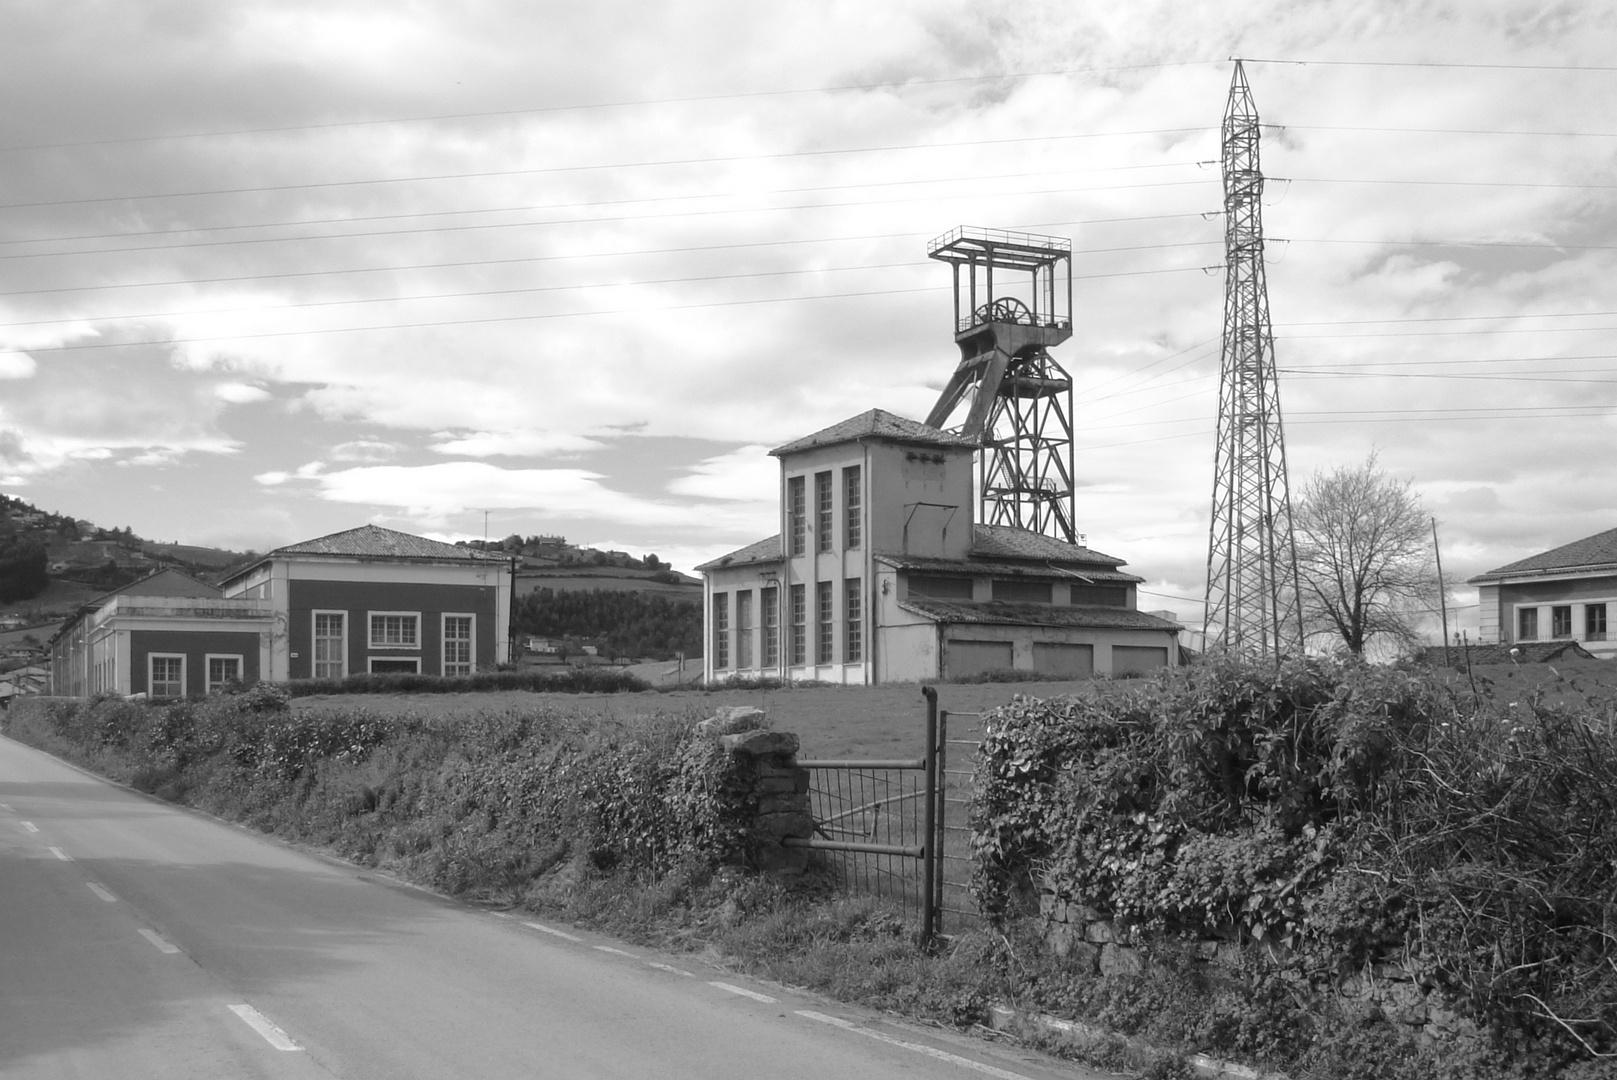 La Camocha Colliery. Gijón - Northern Spain.